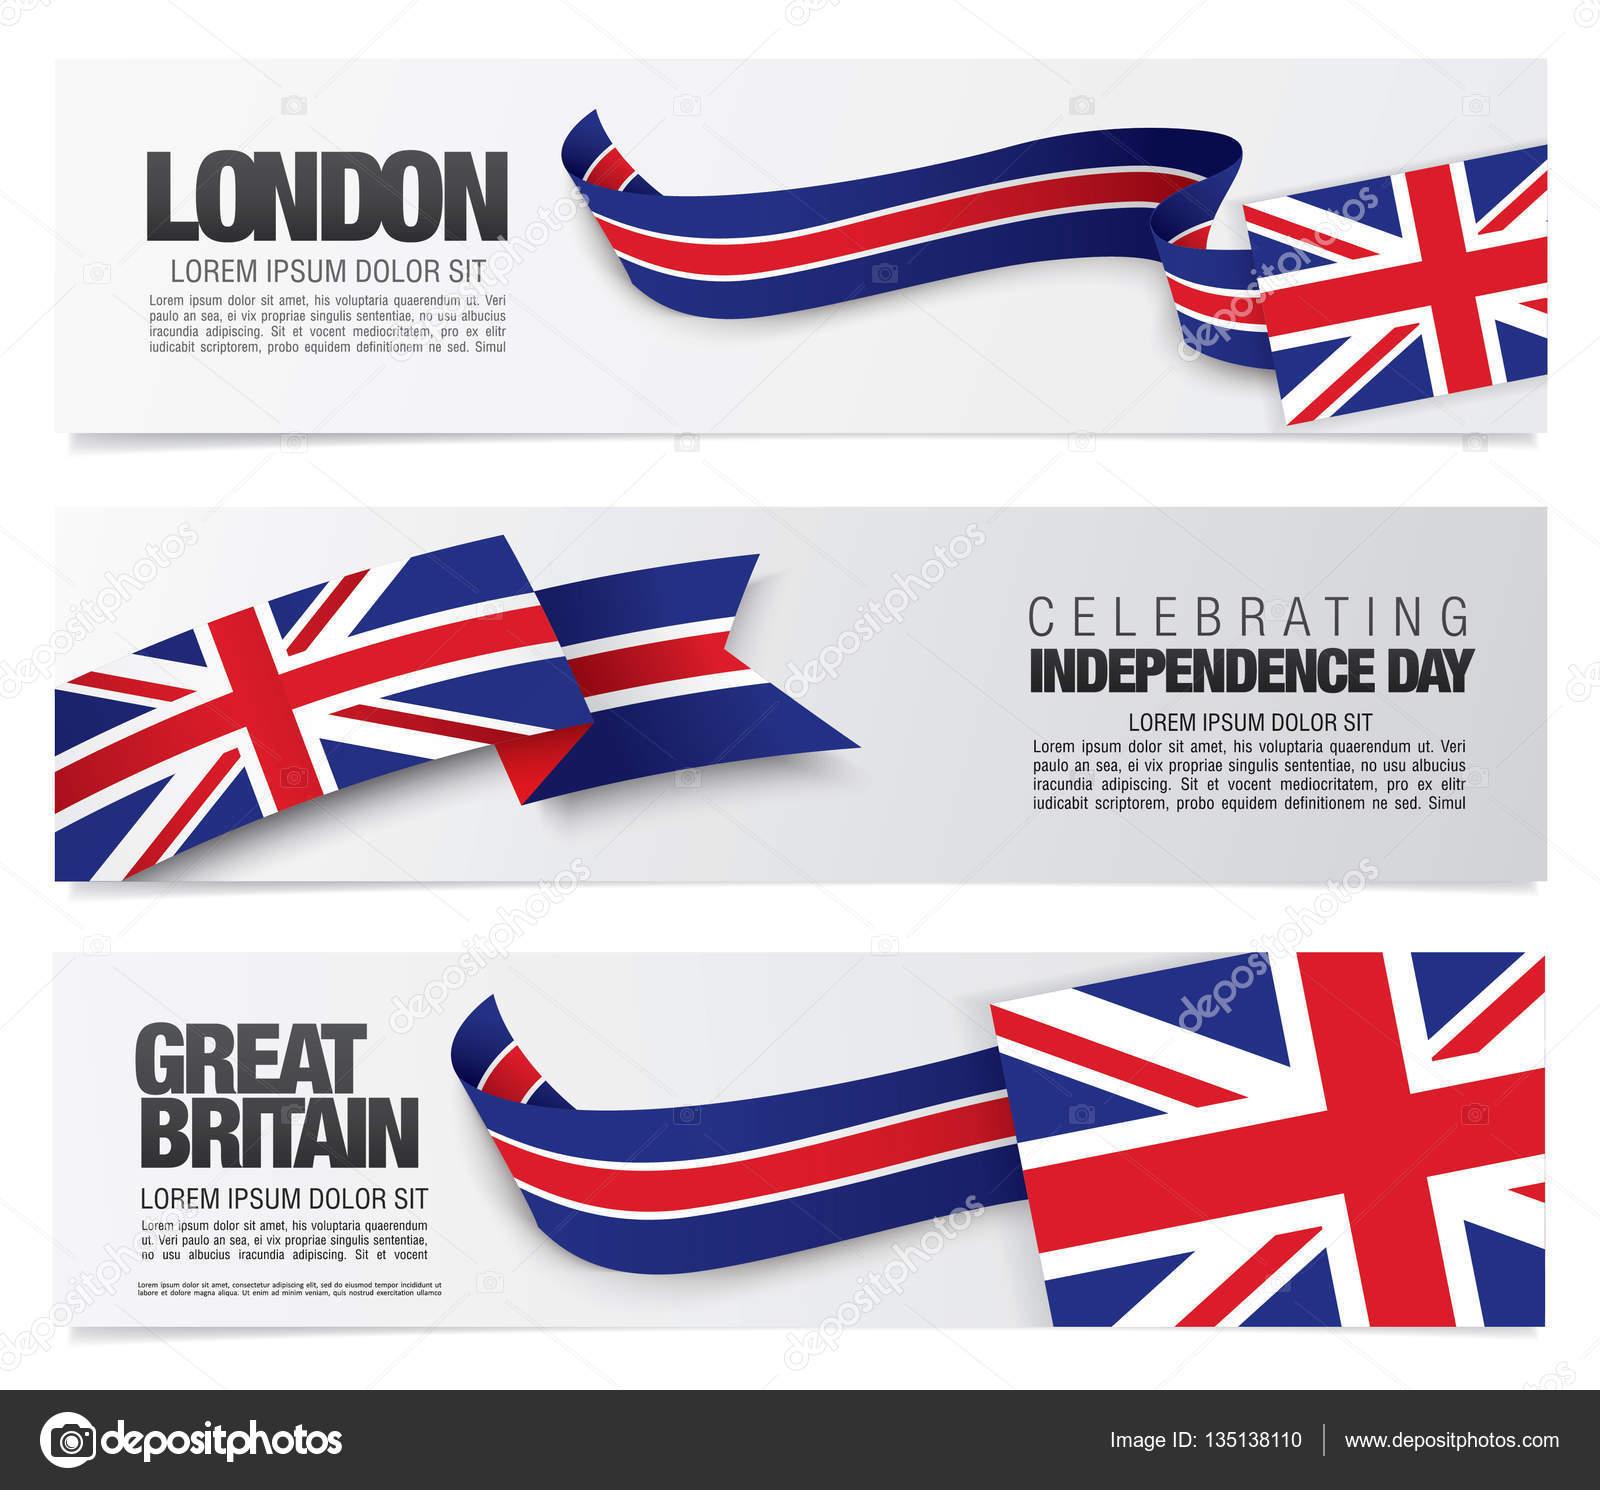 Großbritannien Flagge Vorlage — Stockvektor © Igor_Vkv #135138110